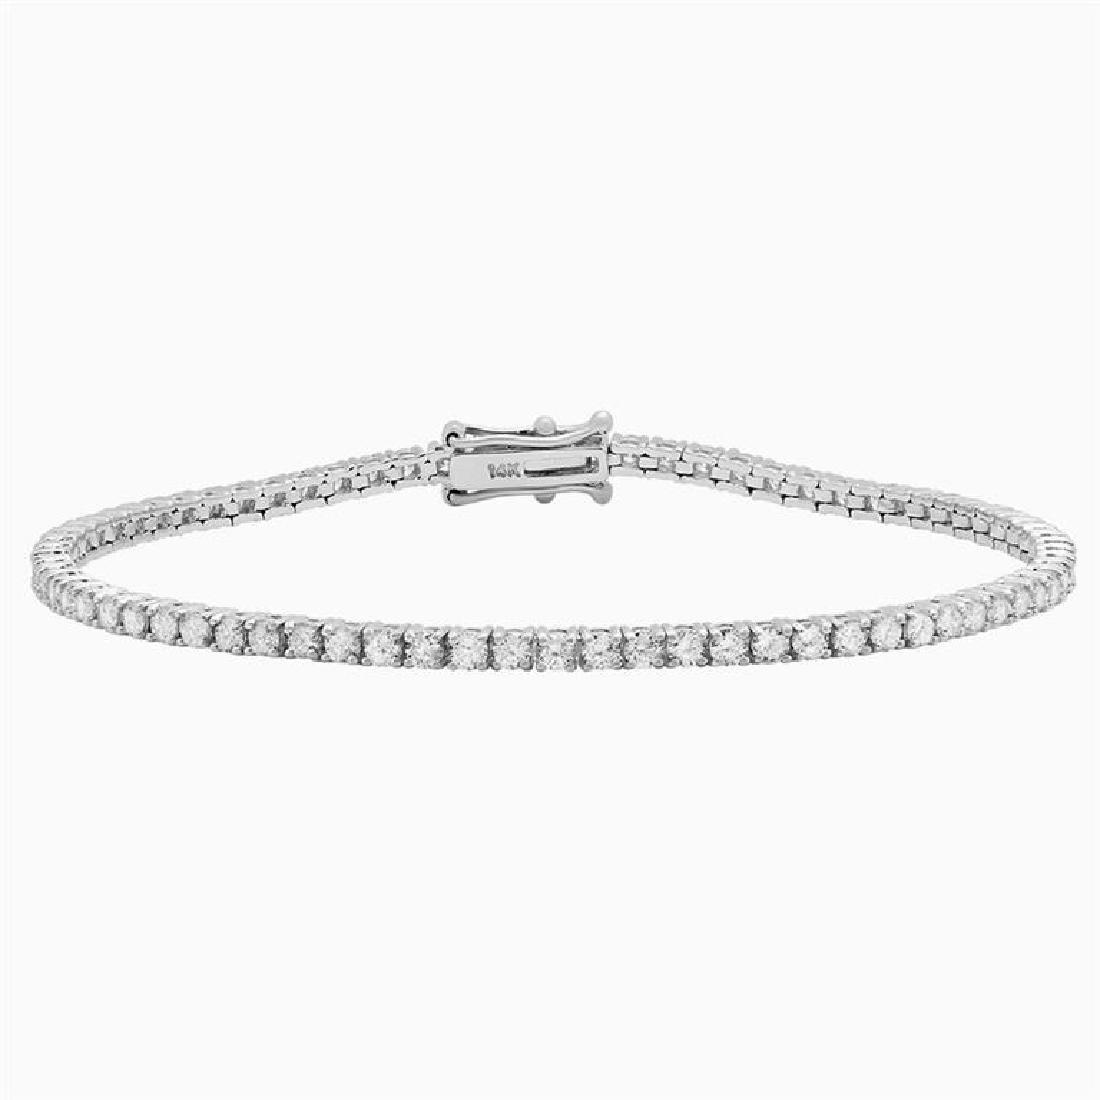 18k White Gold 6.90ct Diamond Tennis Bracelet